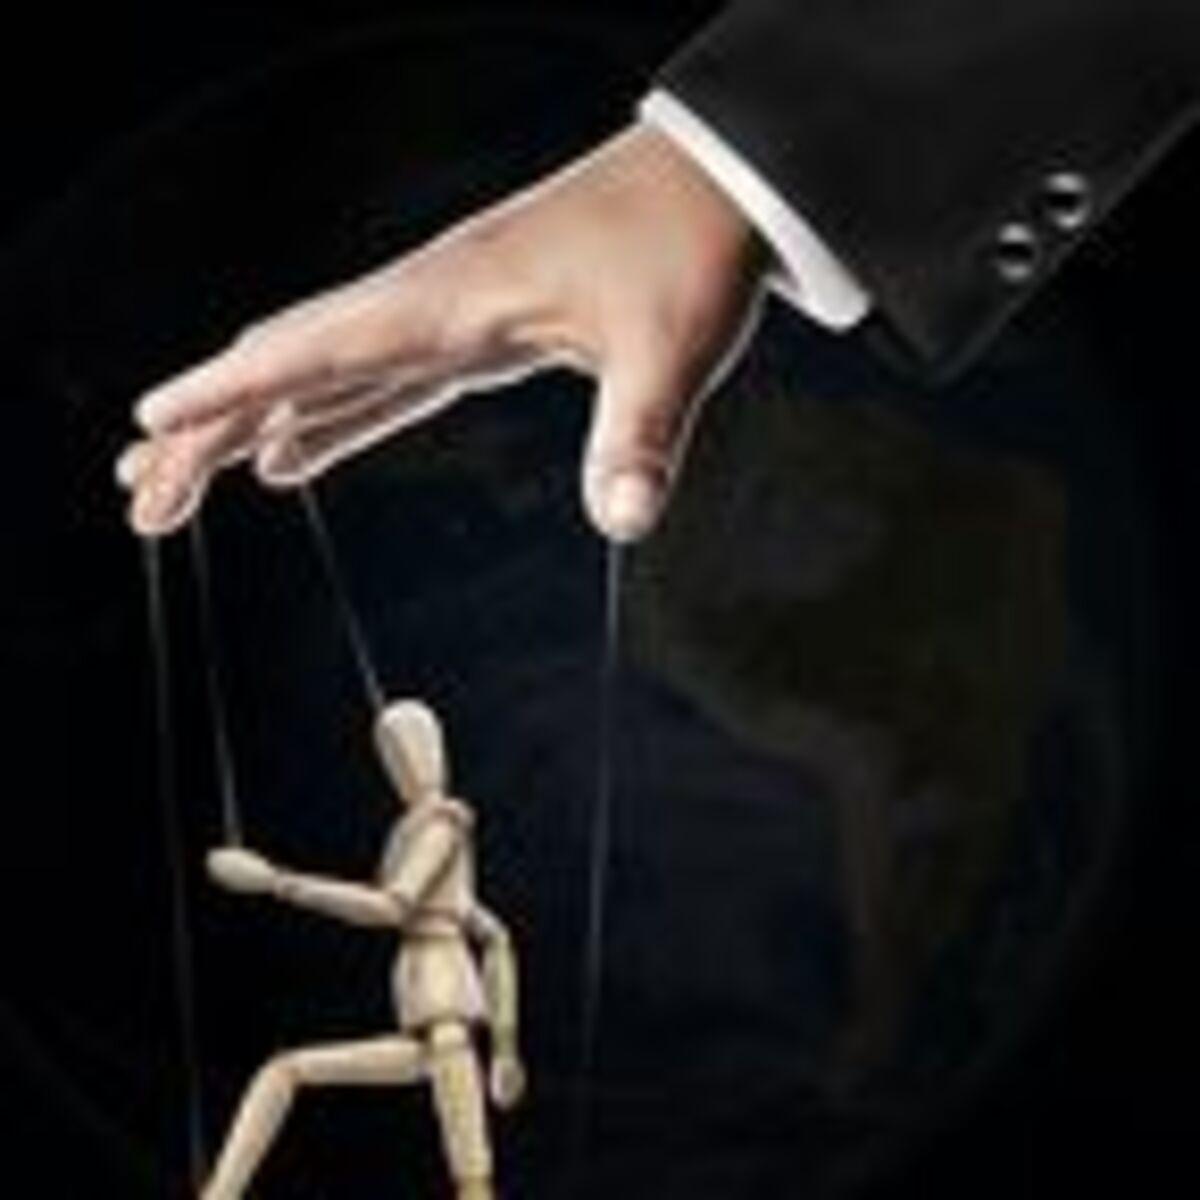 A New Take on Manipulation   Psychology Today